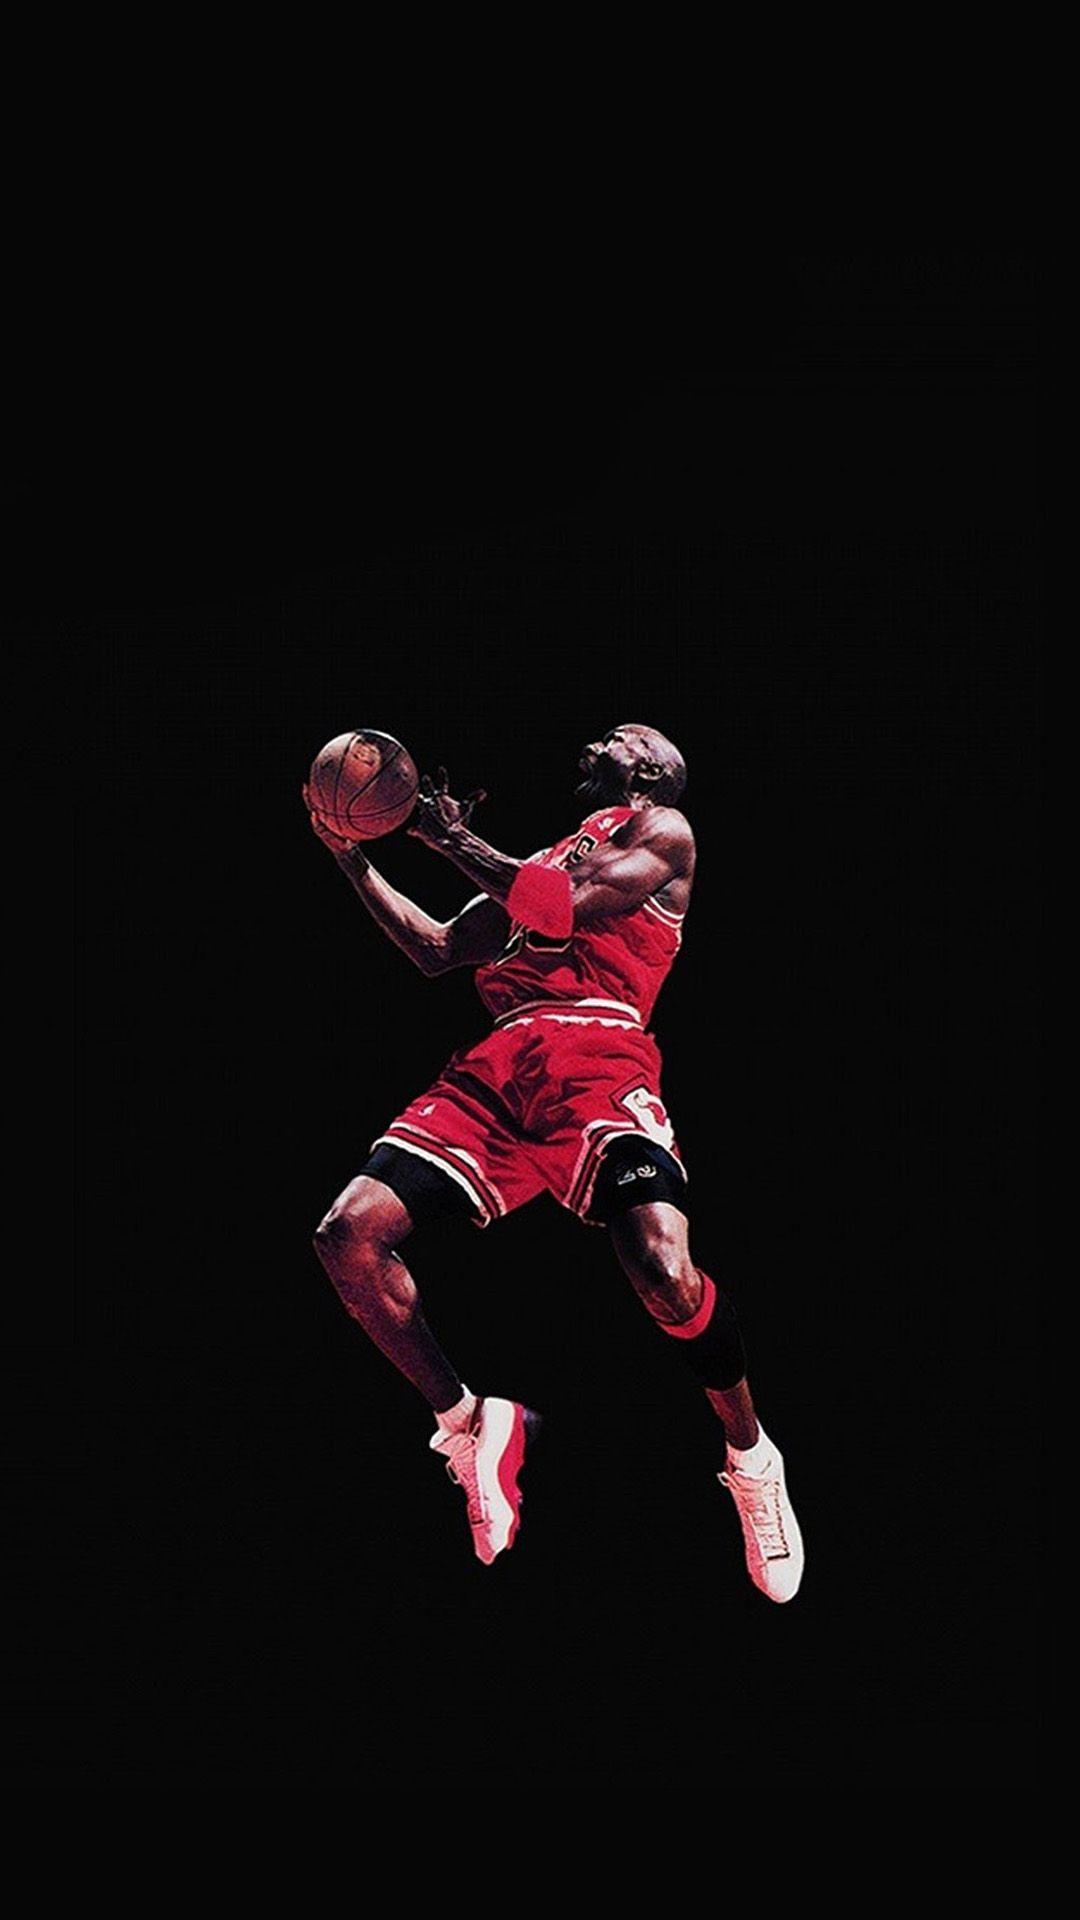 Air Jordan Samsung Wallpapers.jpg (1080×1920)